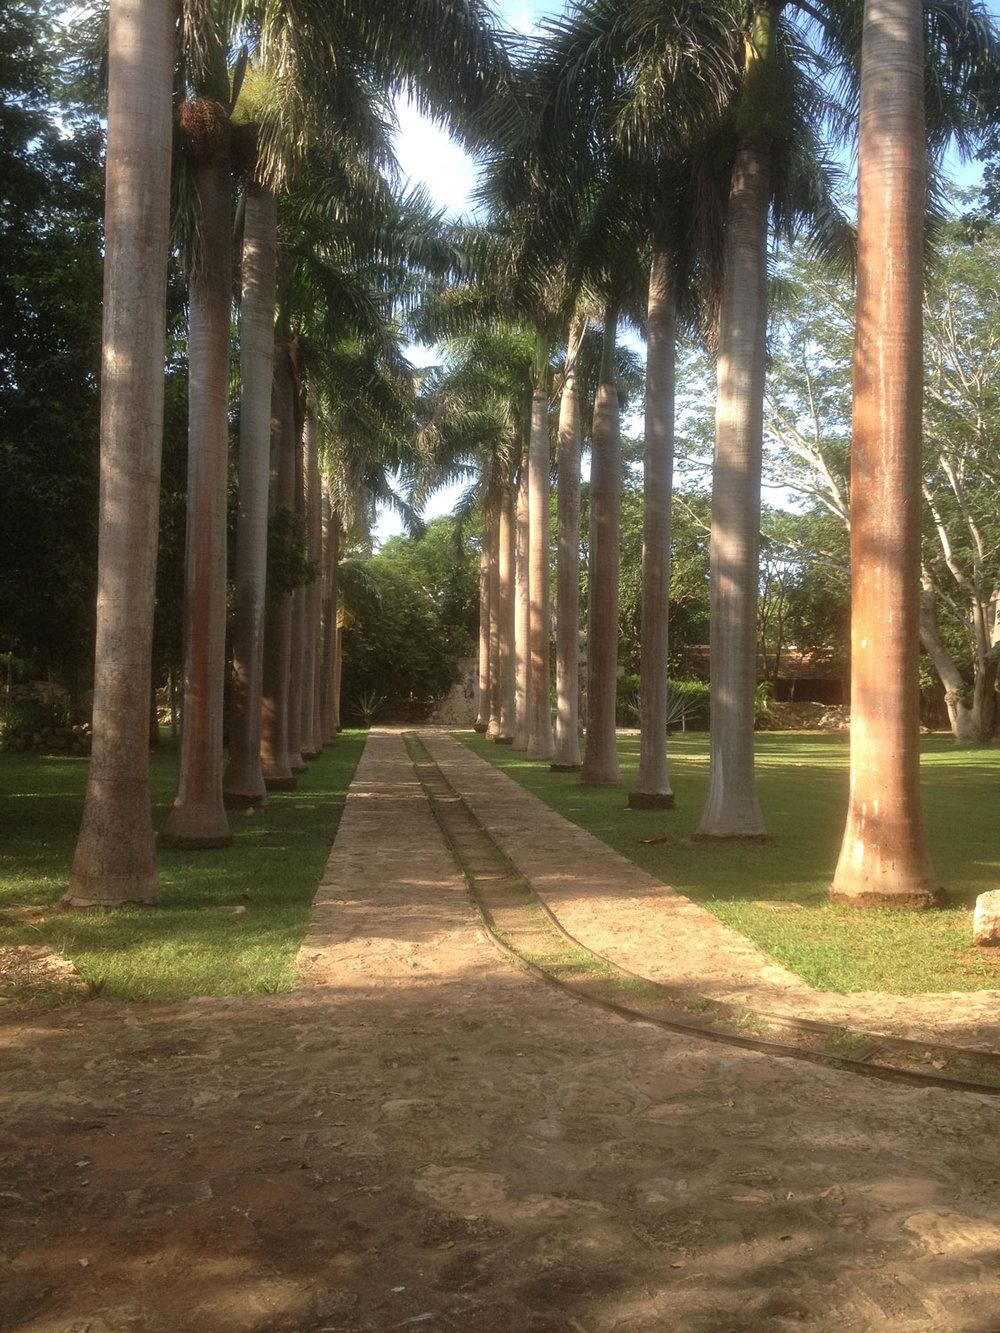 Hammocks_and_Ruins_Blog_Riviera_Maya_Mexico_Travel_Discover_Yucatan_What_to_do_Hacienda_Ochil_15.jpg